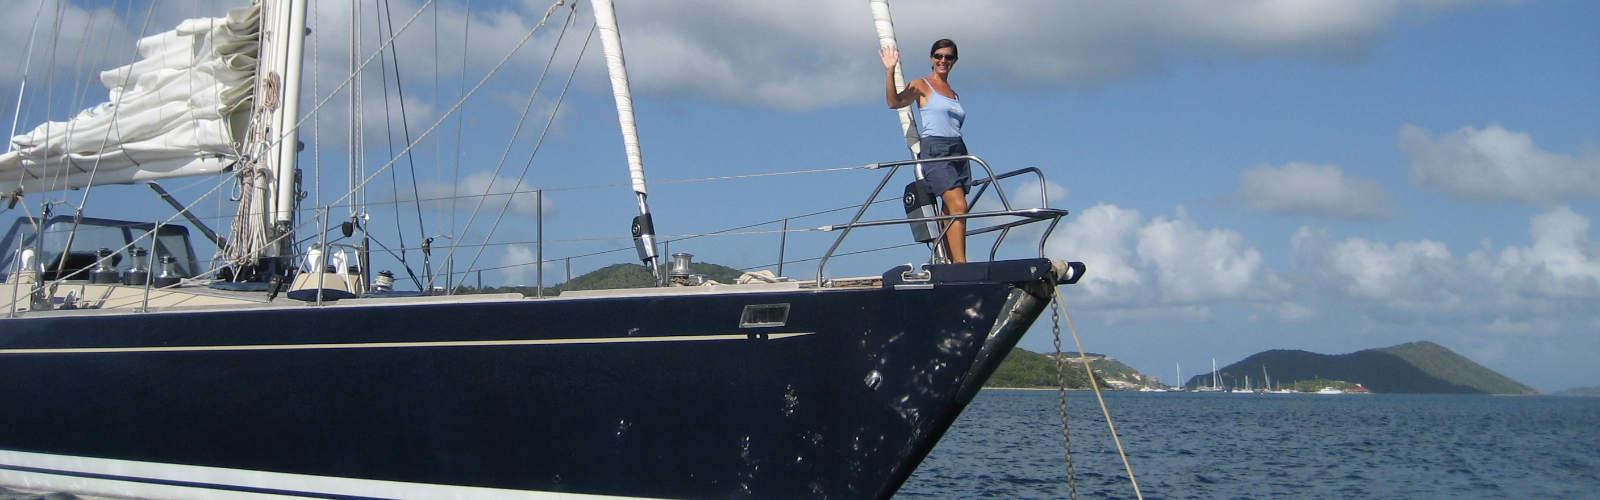 caribbean yacht charters